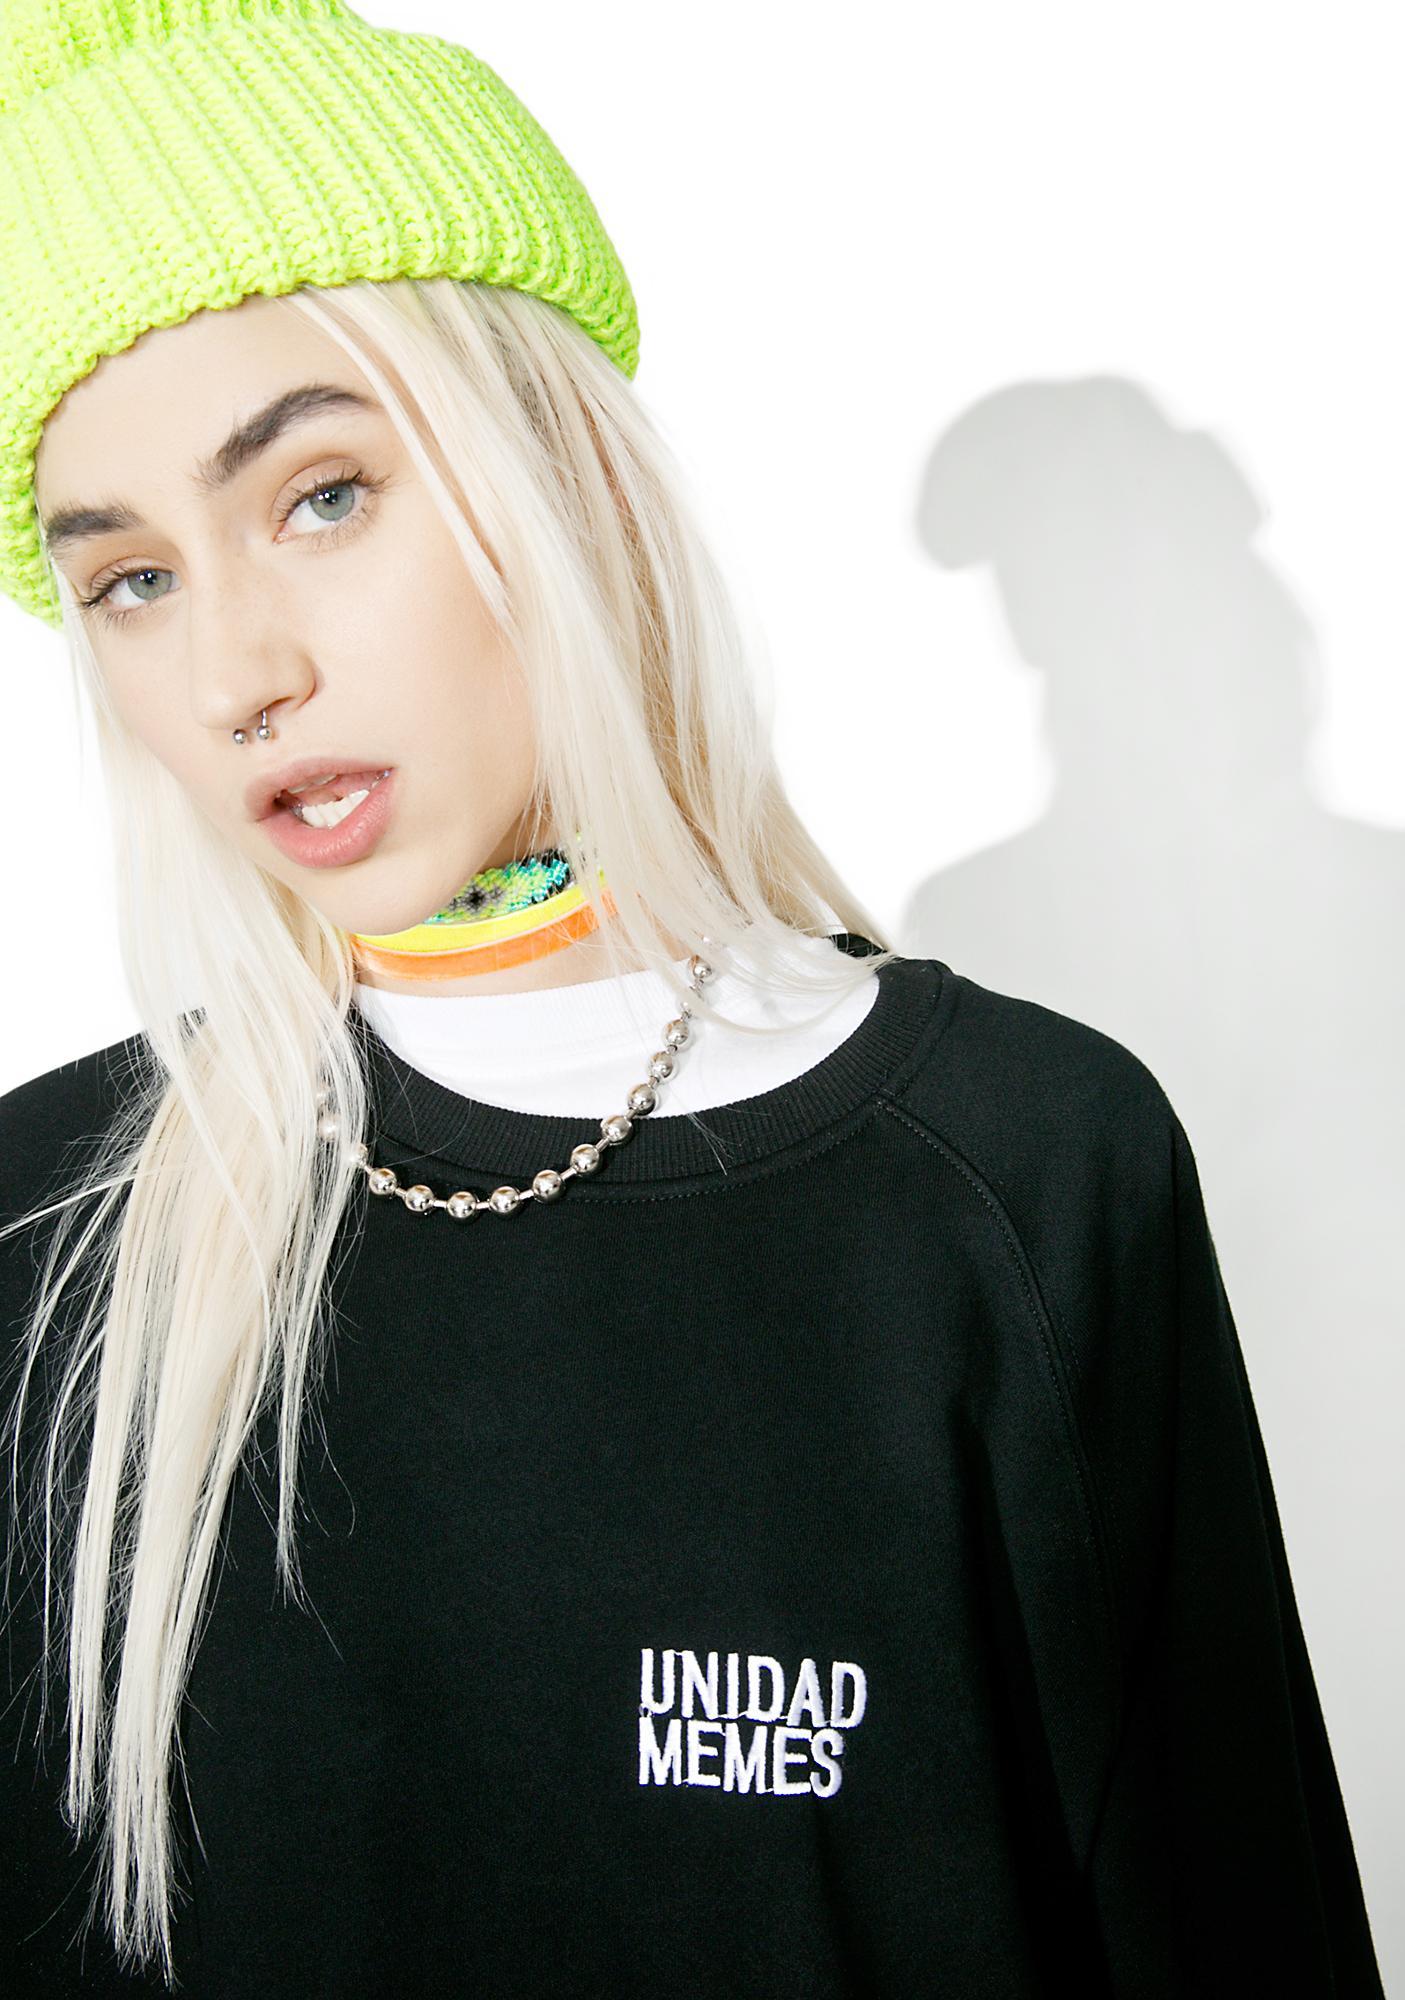 Vetememes Unidad Memes Sweater